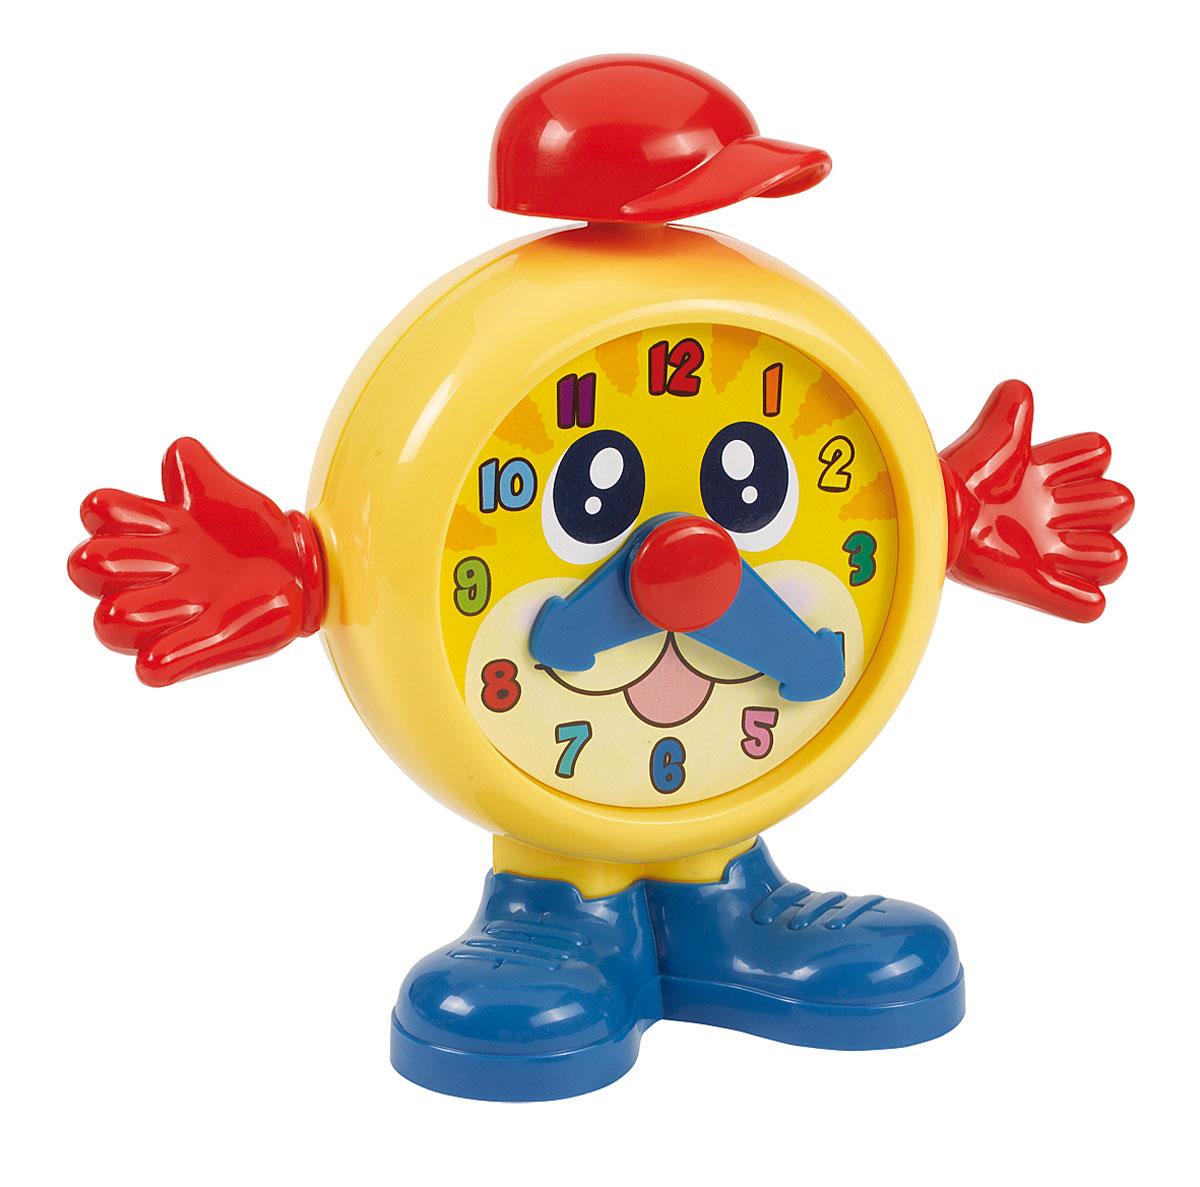 Simba Обучающая игрушка Часики цвет желтый красный синий